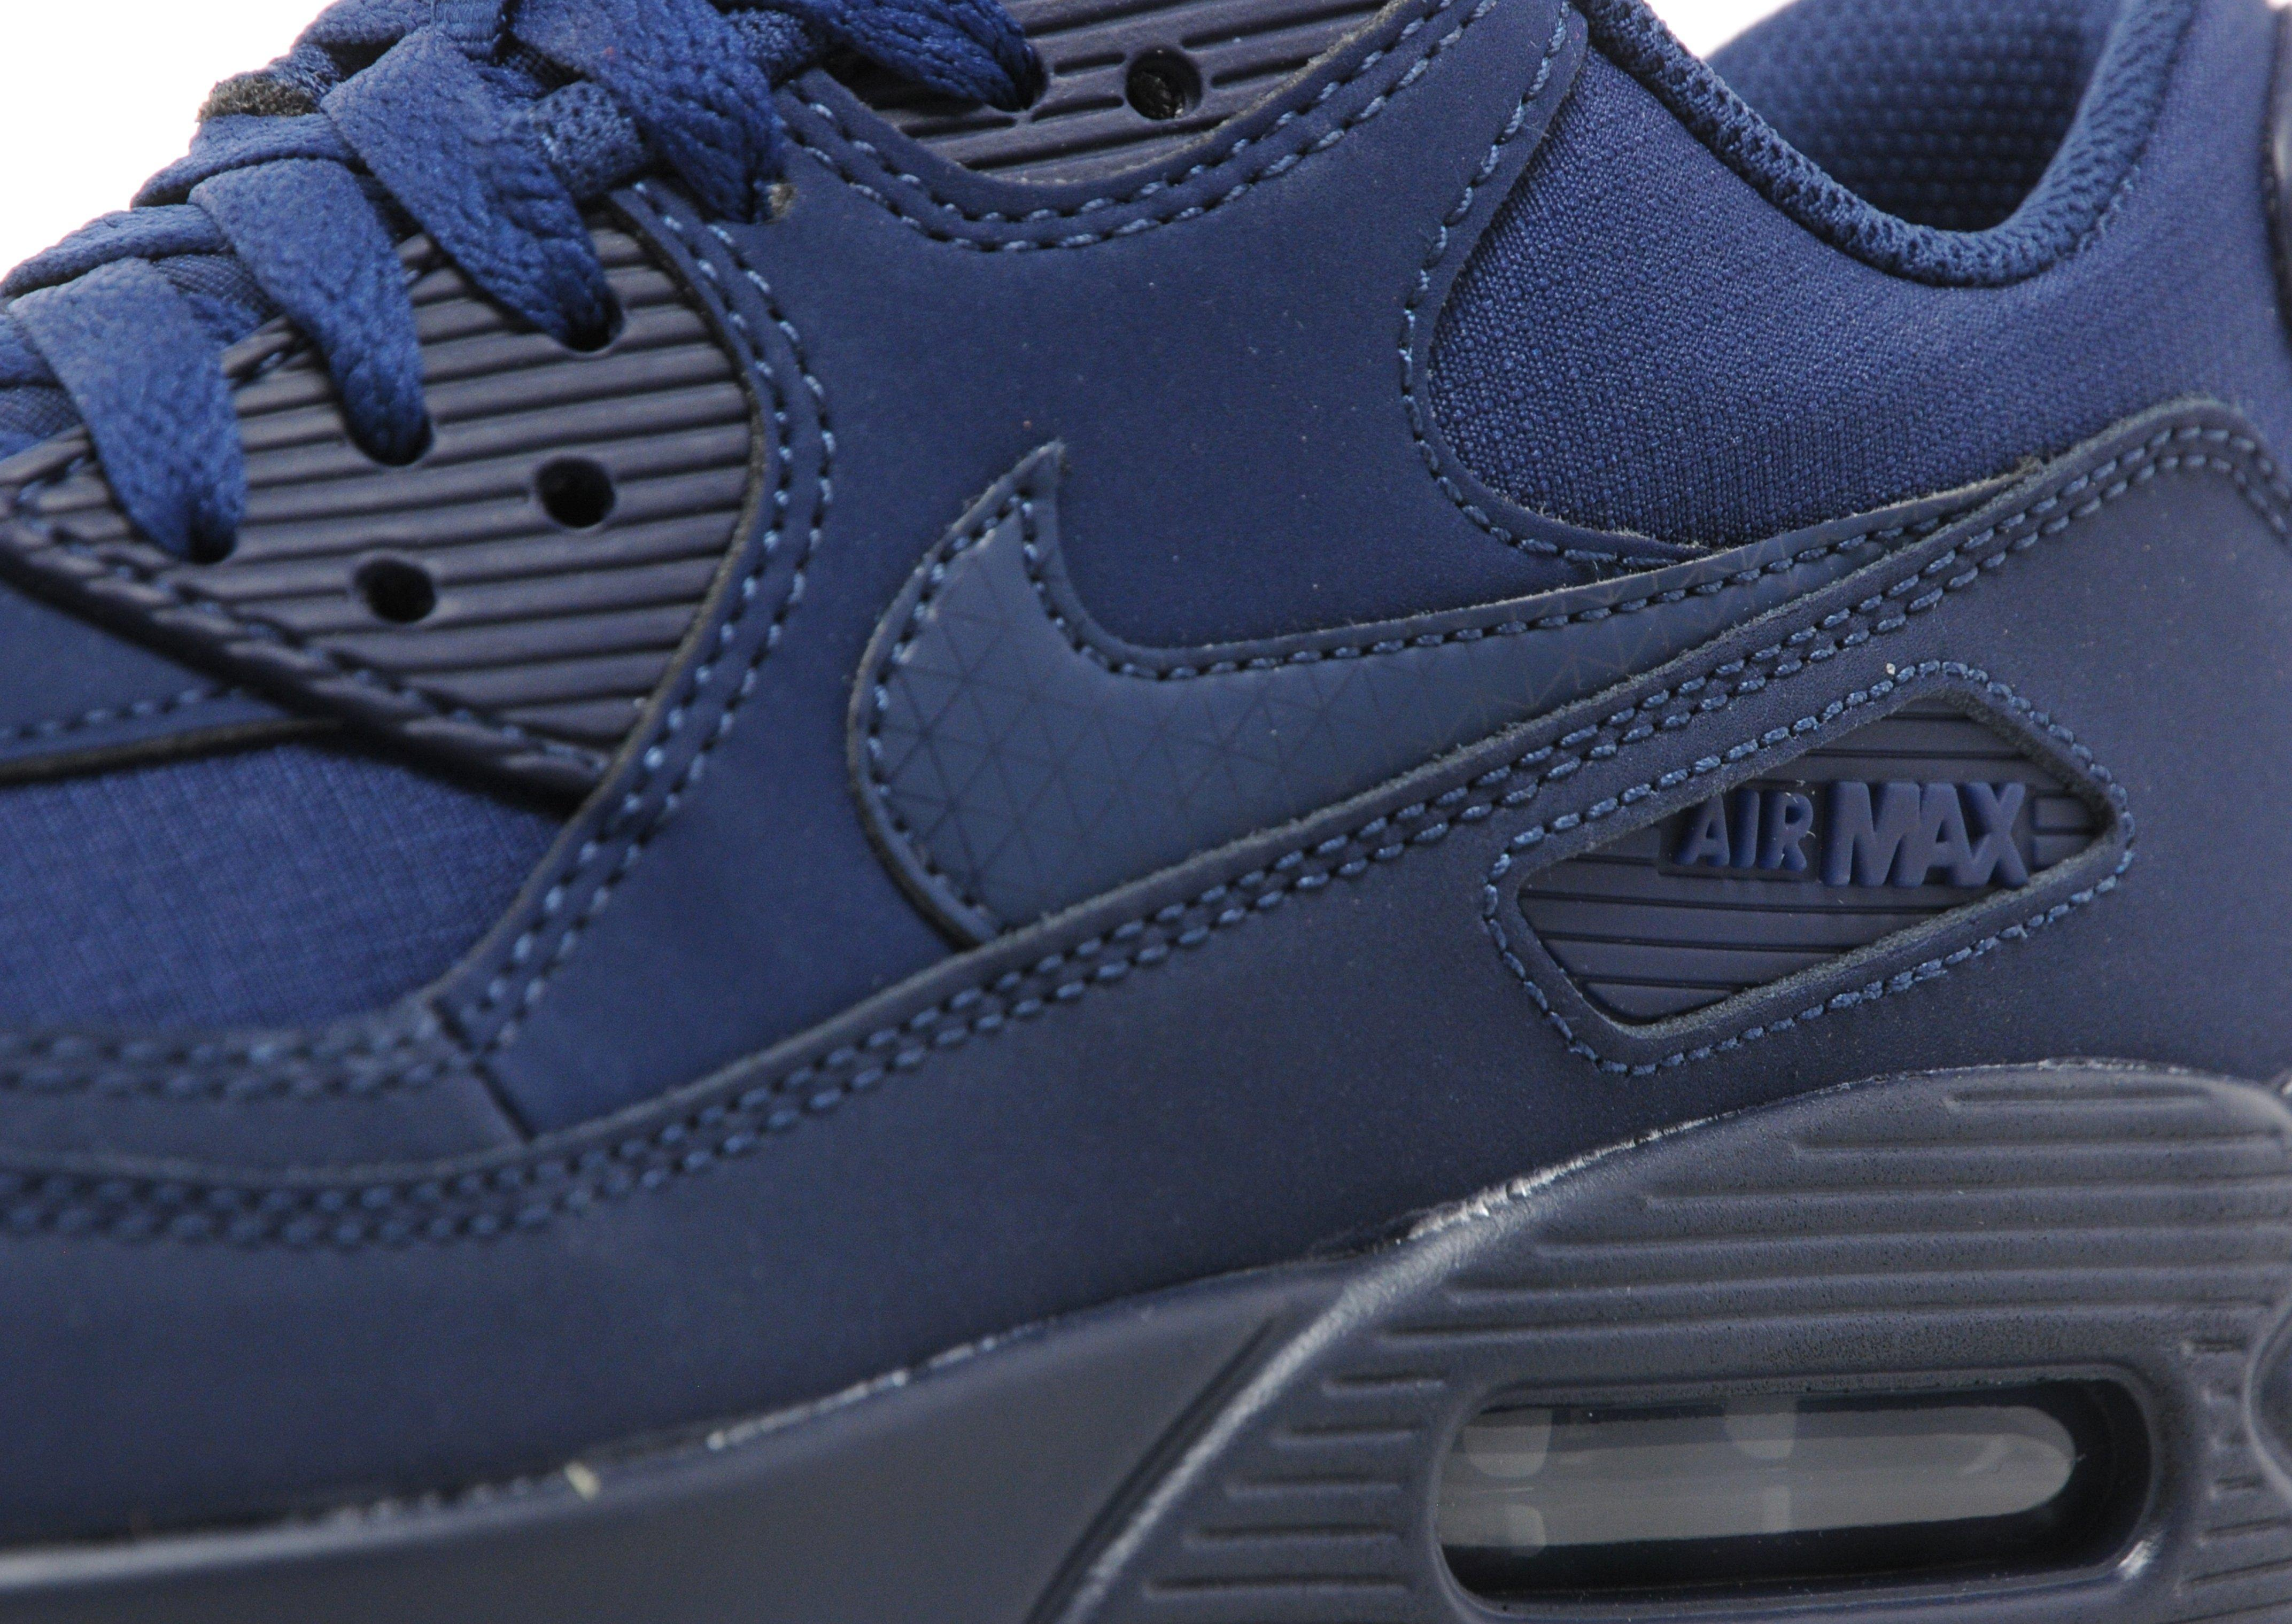 Nike Air Max 90 Azul Marino Jd Rey salida exclusiva descuento grande barato baúl de descuento 1BXanj2M